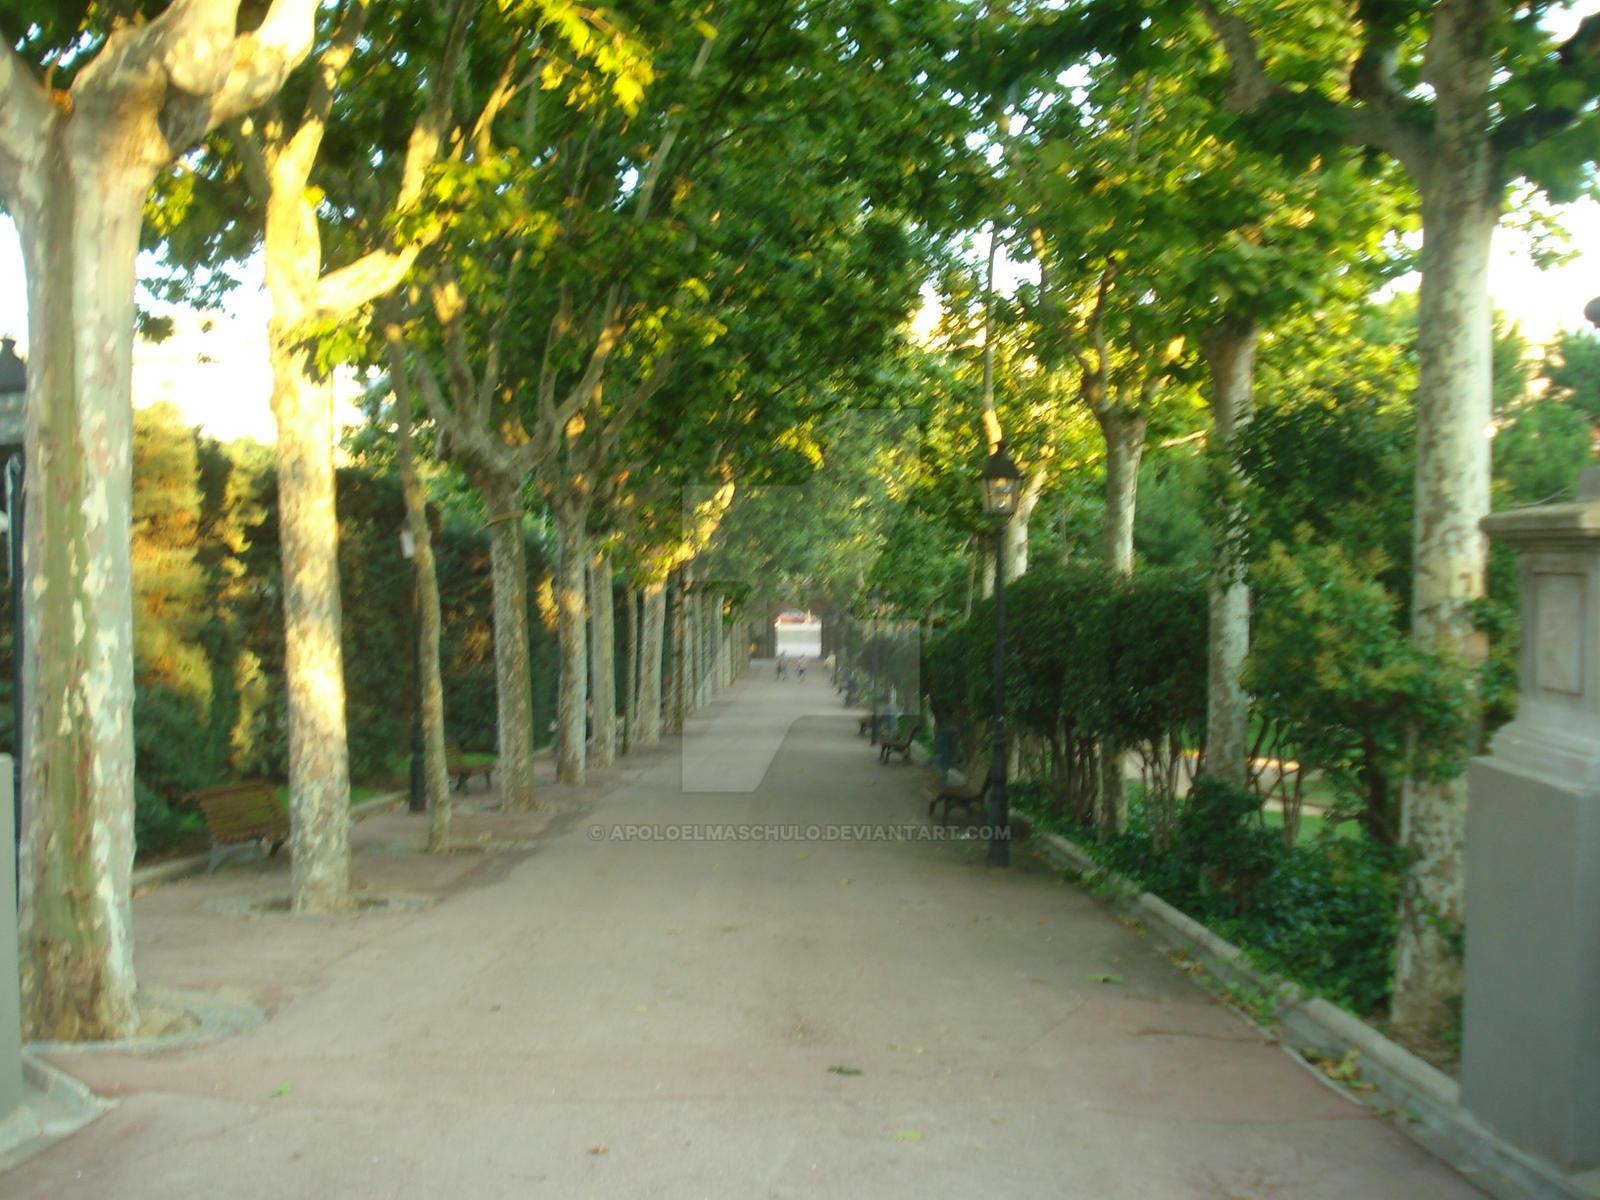 Parc de Can Buixeres by Apoloelmaschulo